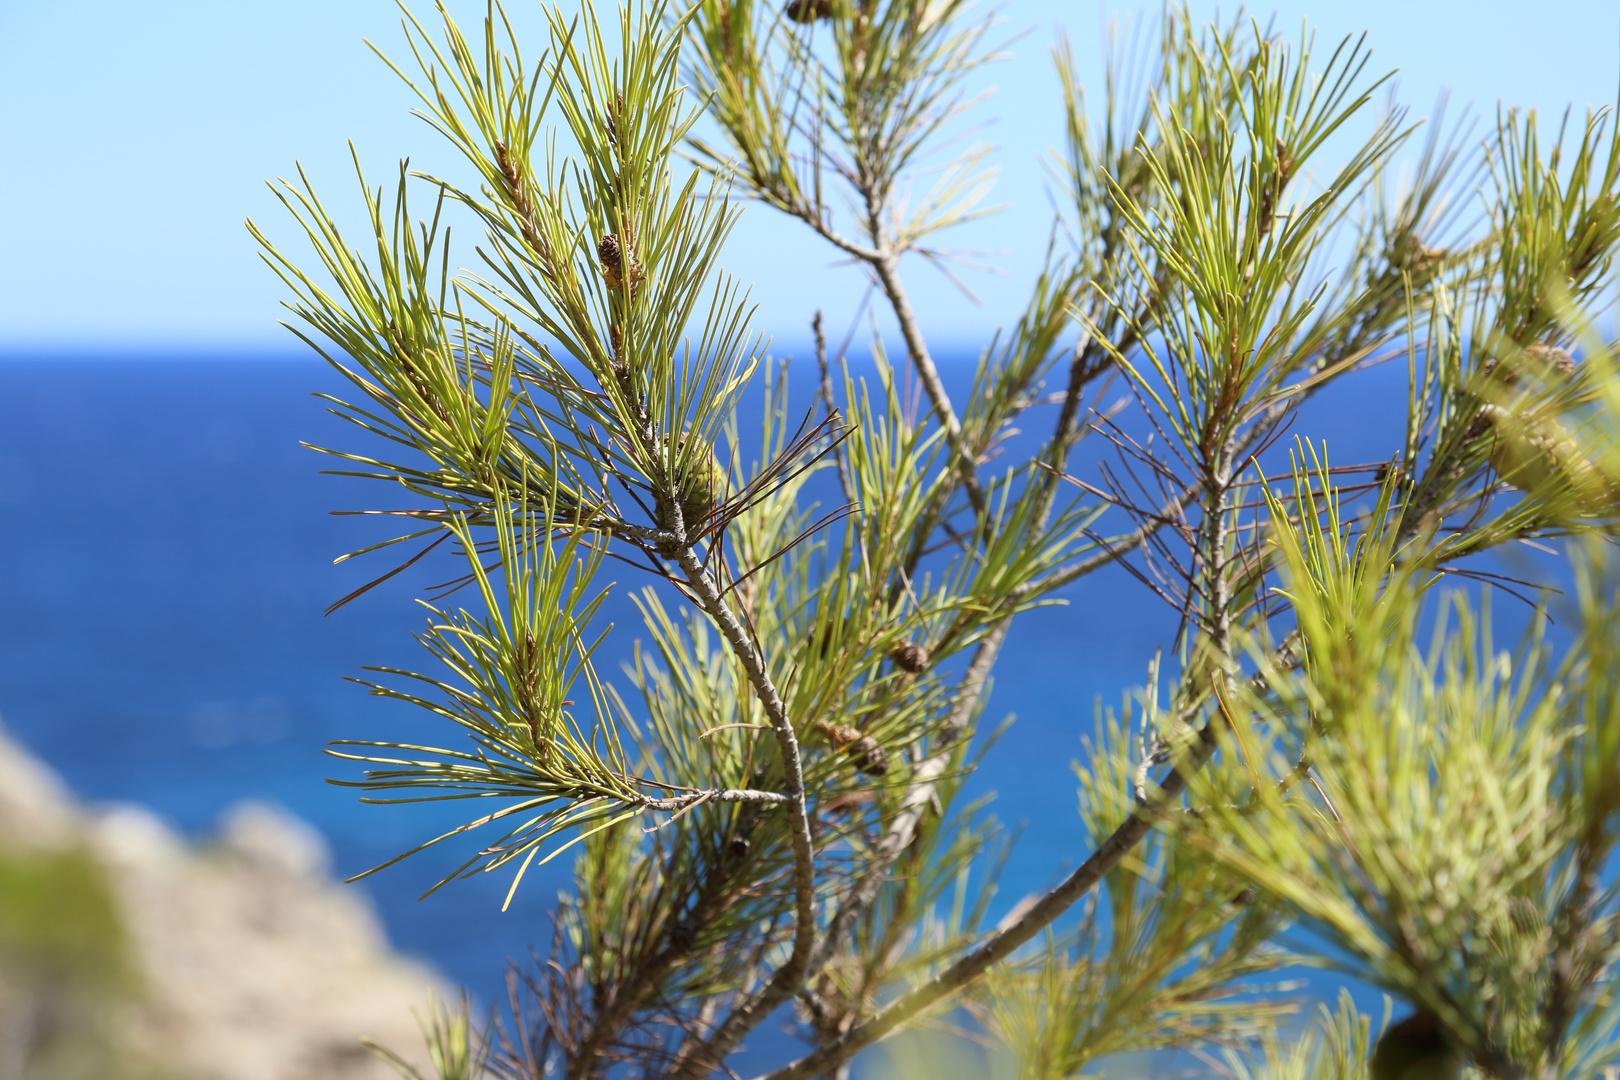 Baum am Meer (2)